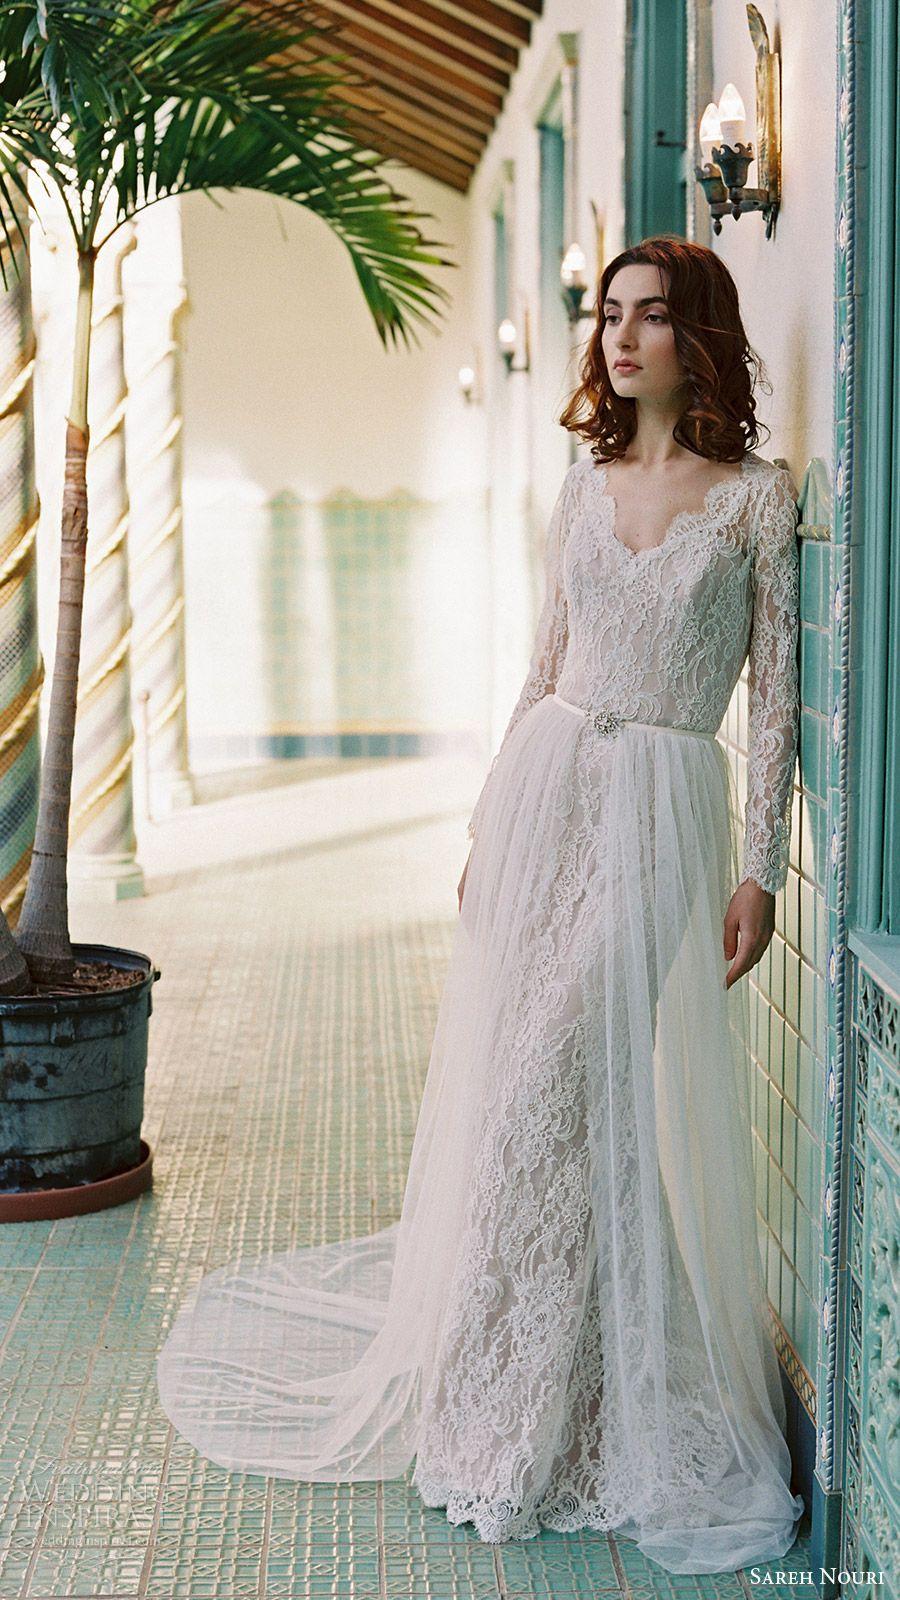 Sareh nouri bridal spring wedding dresses wedding dress